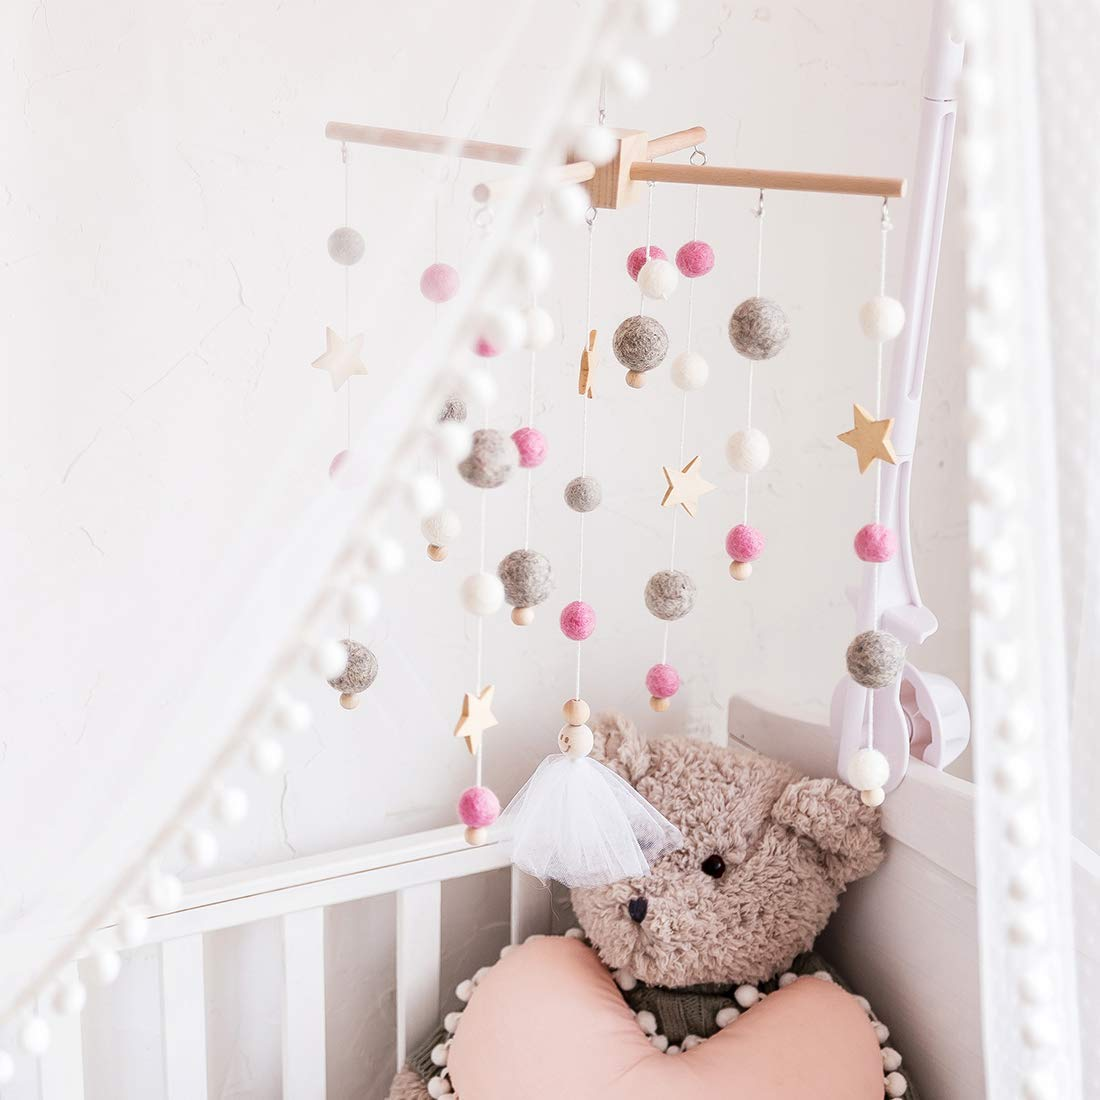 lets make Babybett Mobile H/ölzerne Windspiel Bettglocke Mobile Kinderbett Baby Schlafzimmer Decke Holzperlen Windspiel H/ängen